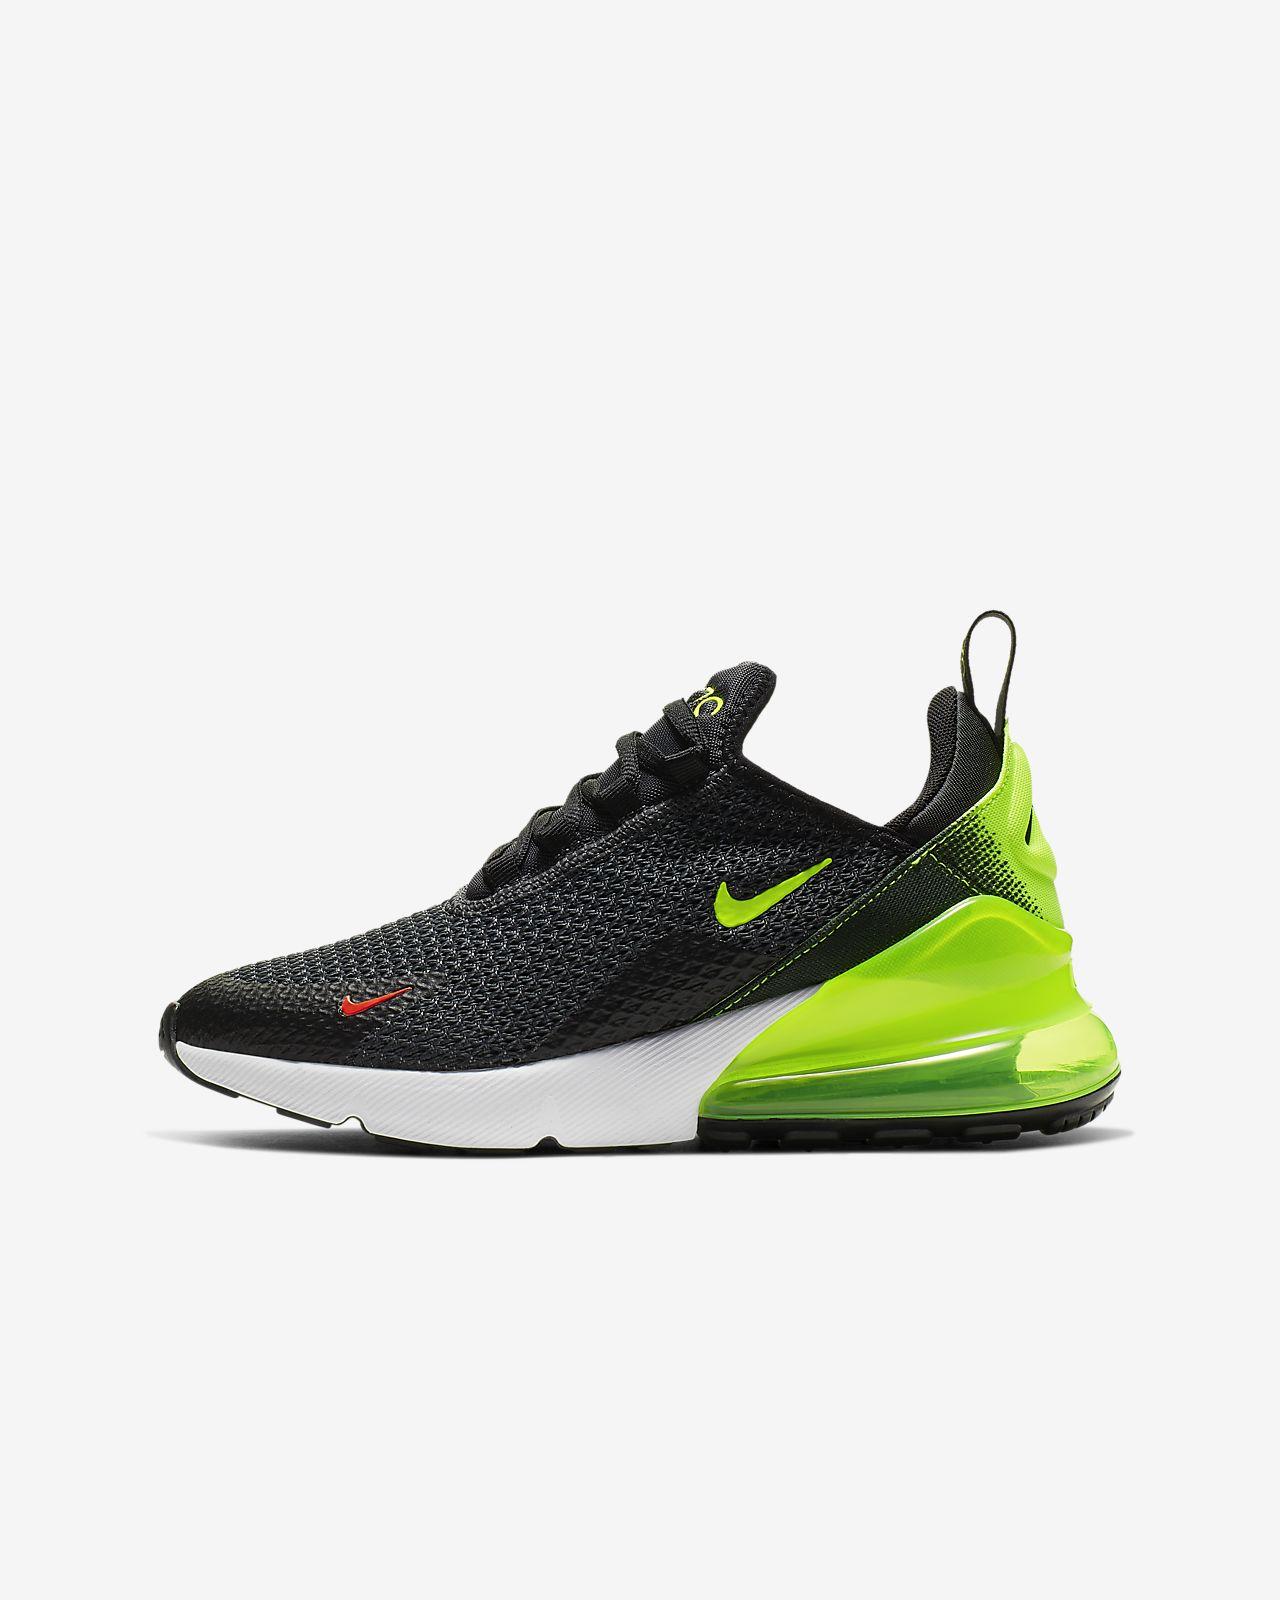 best website 2a58d ffaa8 ... Nike Air Max 270-sko til store børn